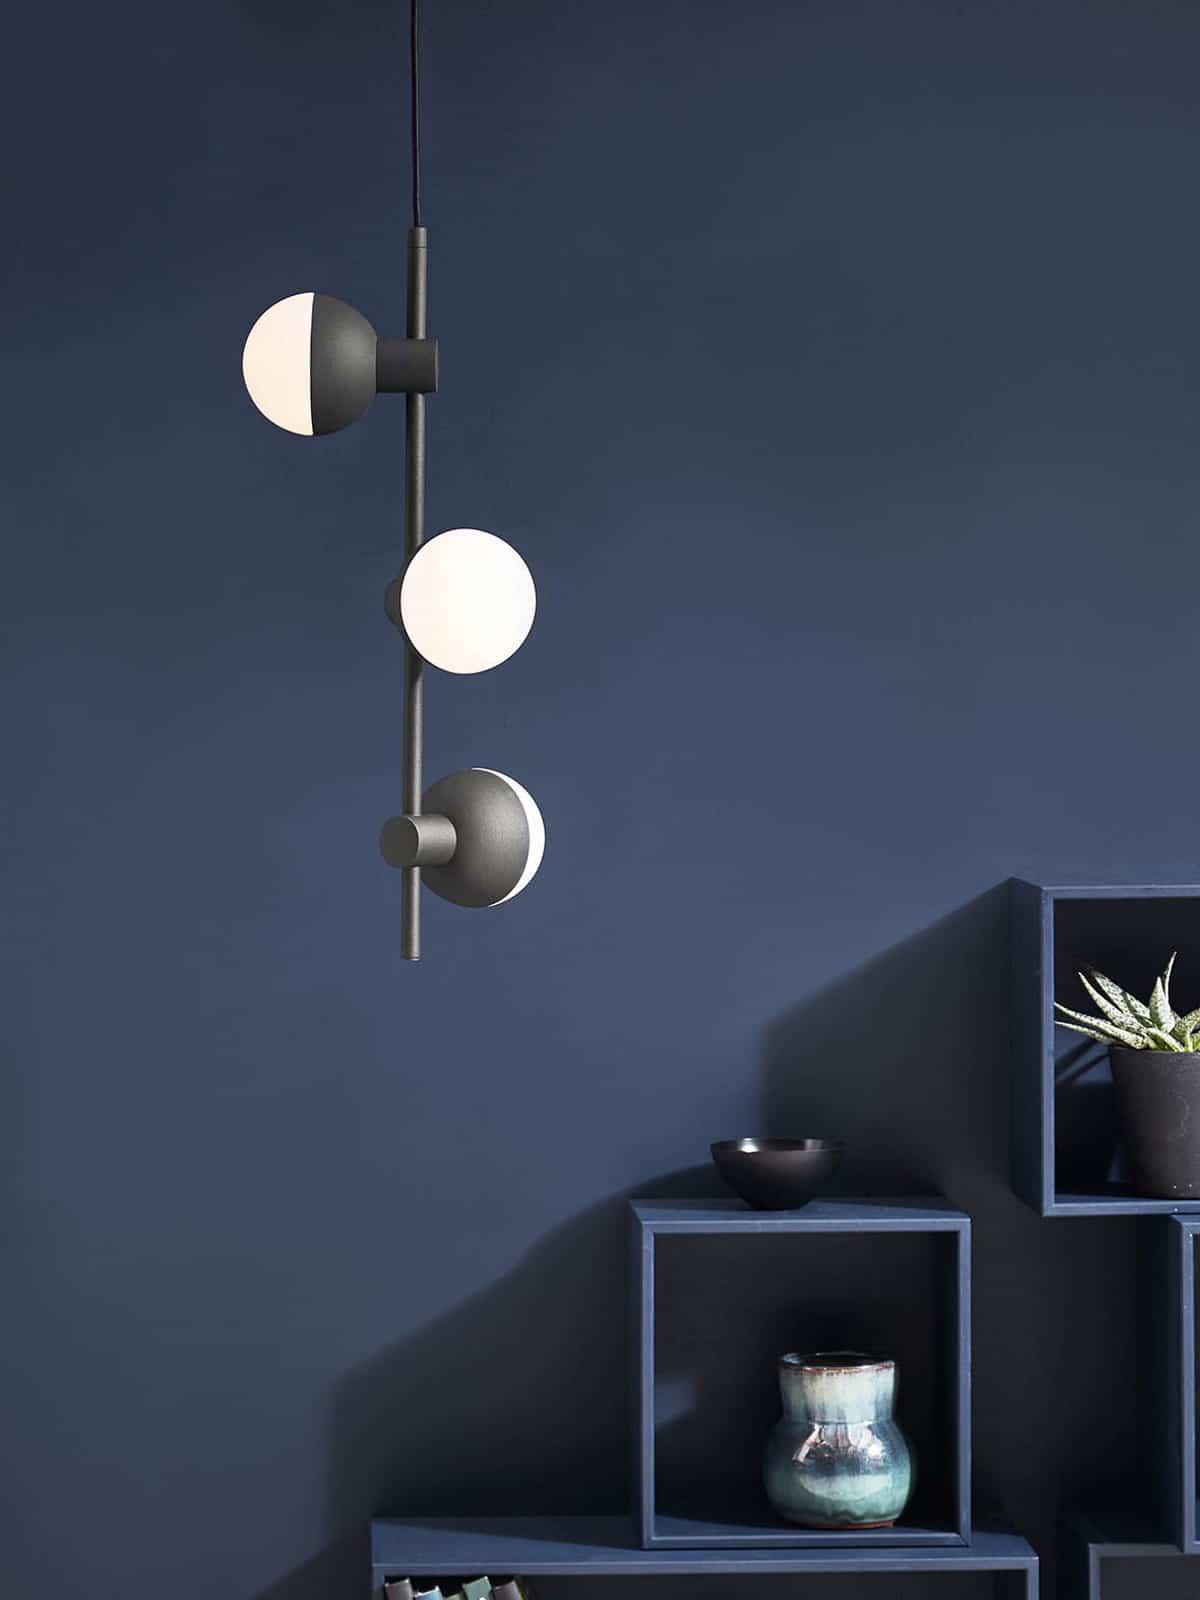 DesignOrt Blog: Kugelige Pendelleuchten Fabian Vertikal Frandsen